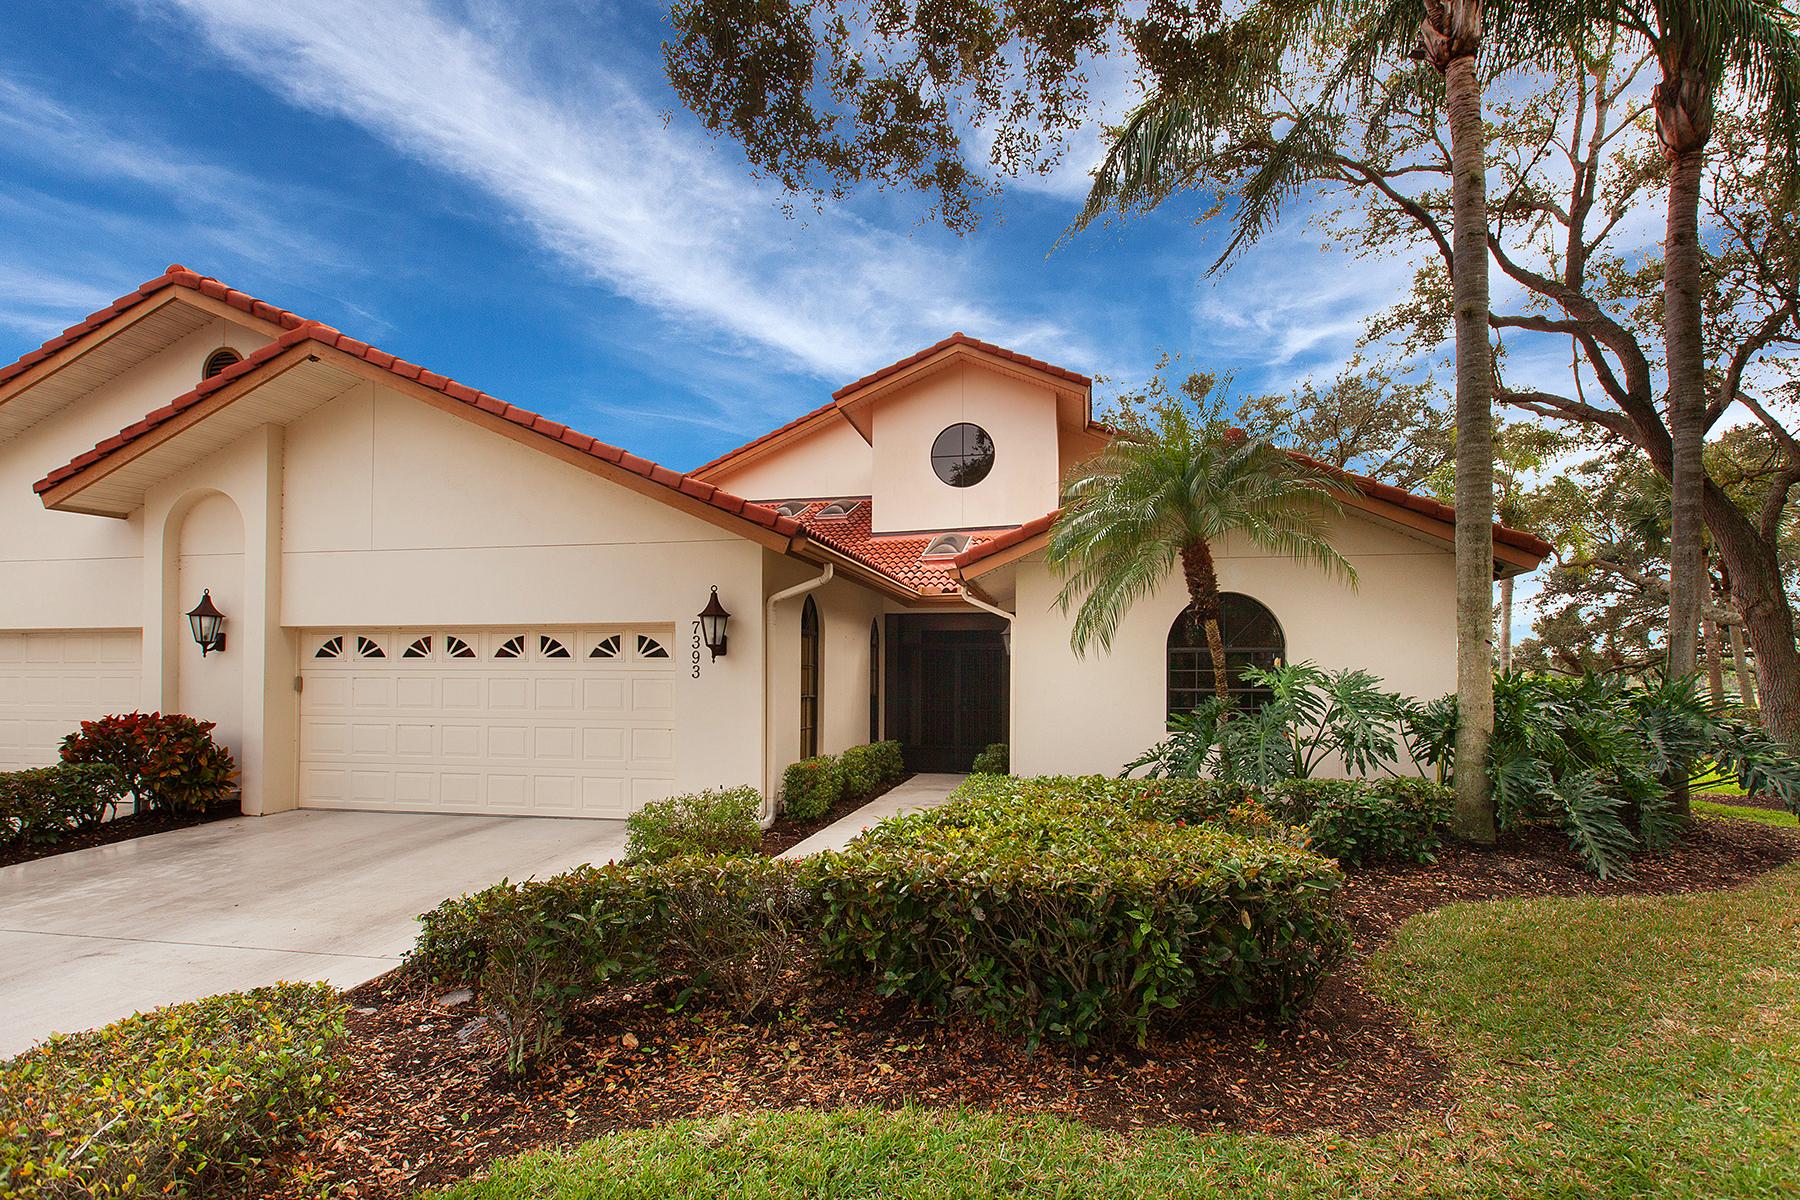 Residência urbana para Venda às PRESTANCIA 7393 Villa D Este Dr Sarasota, Florida, 34238 Estados Unidos